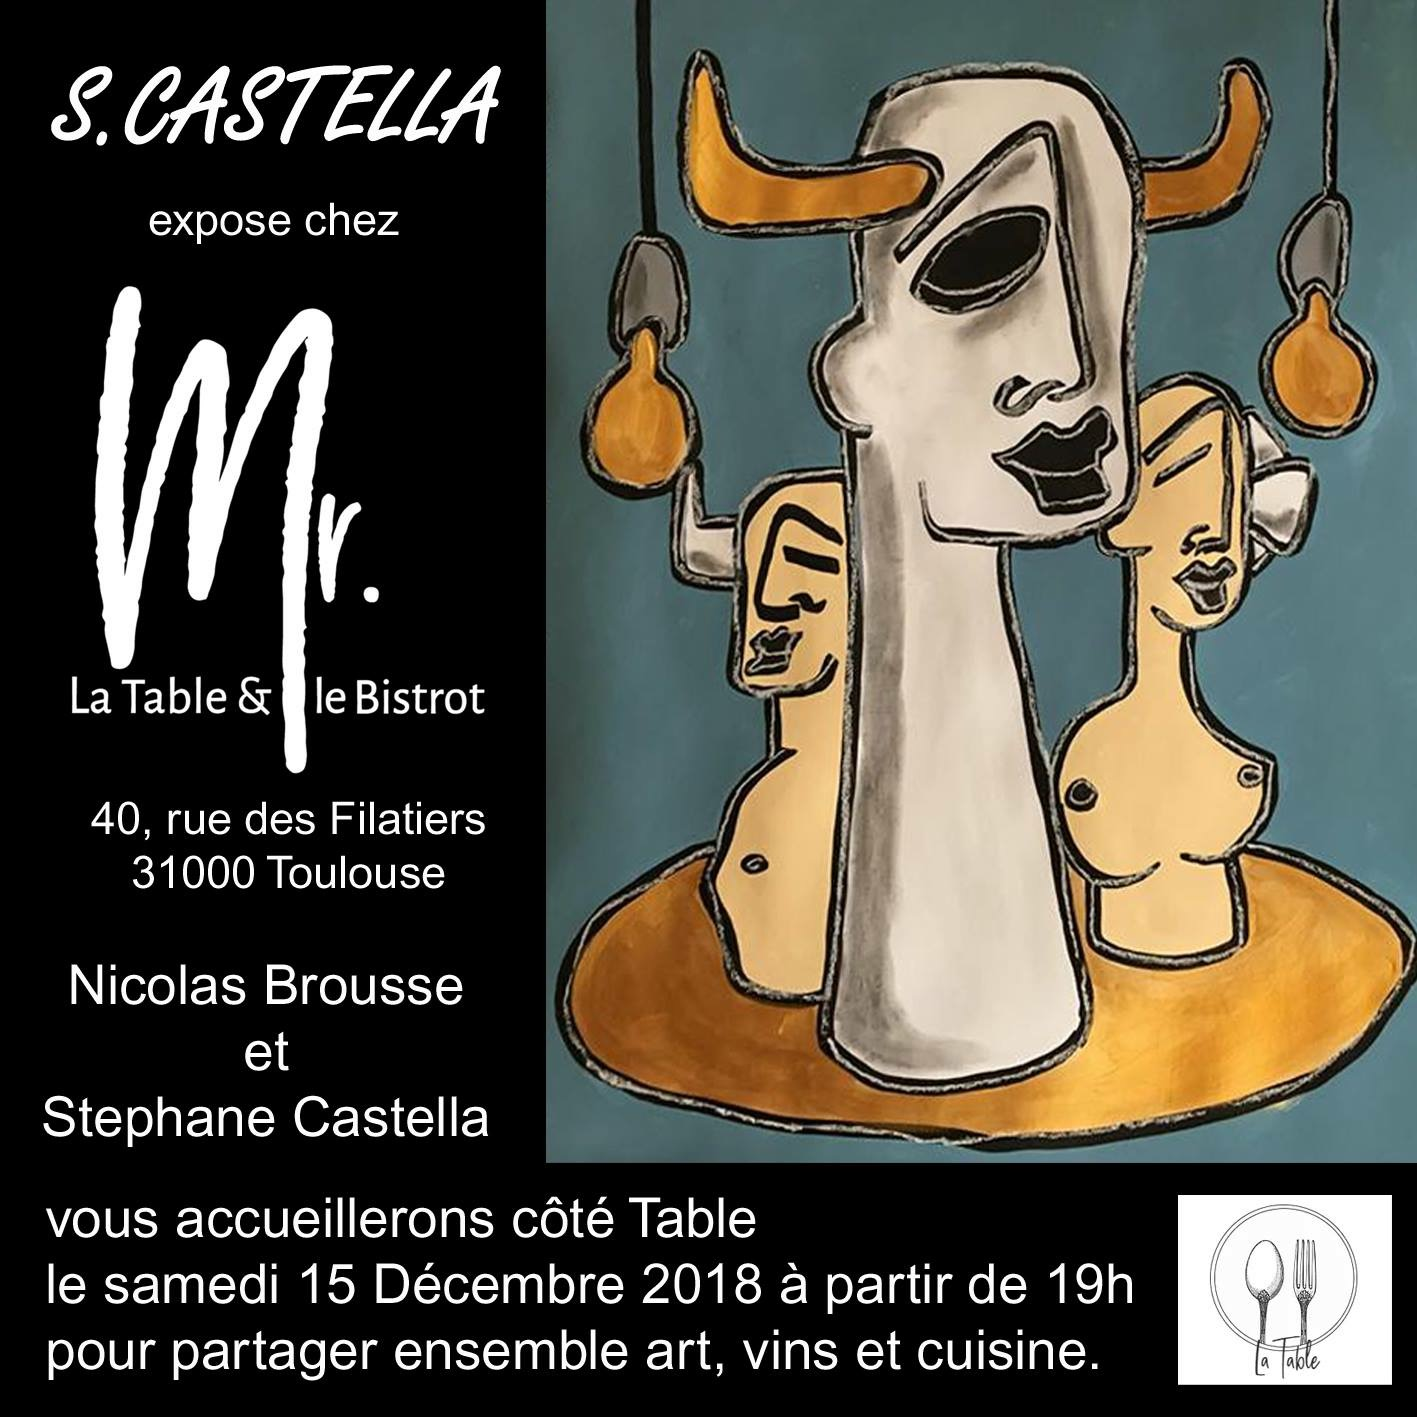 castella exposition monsieur